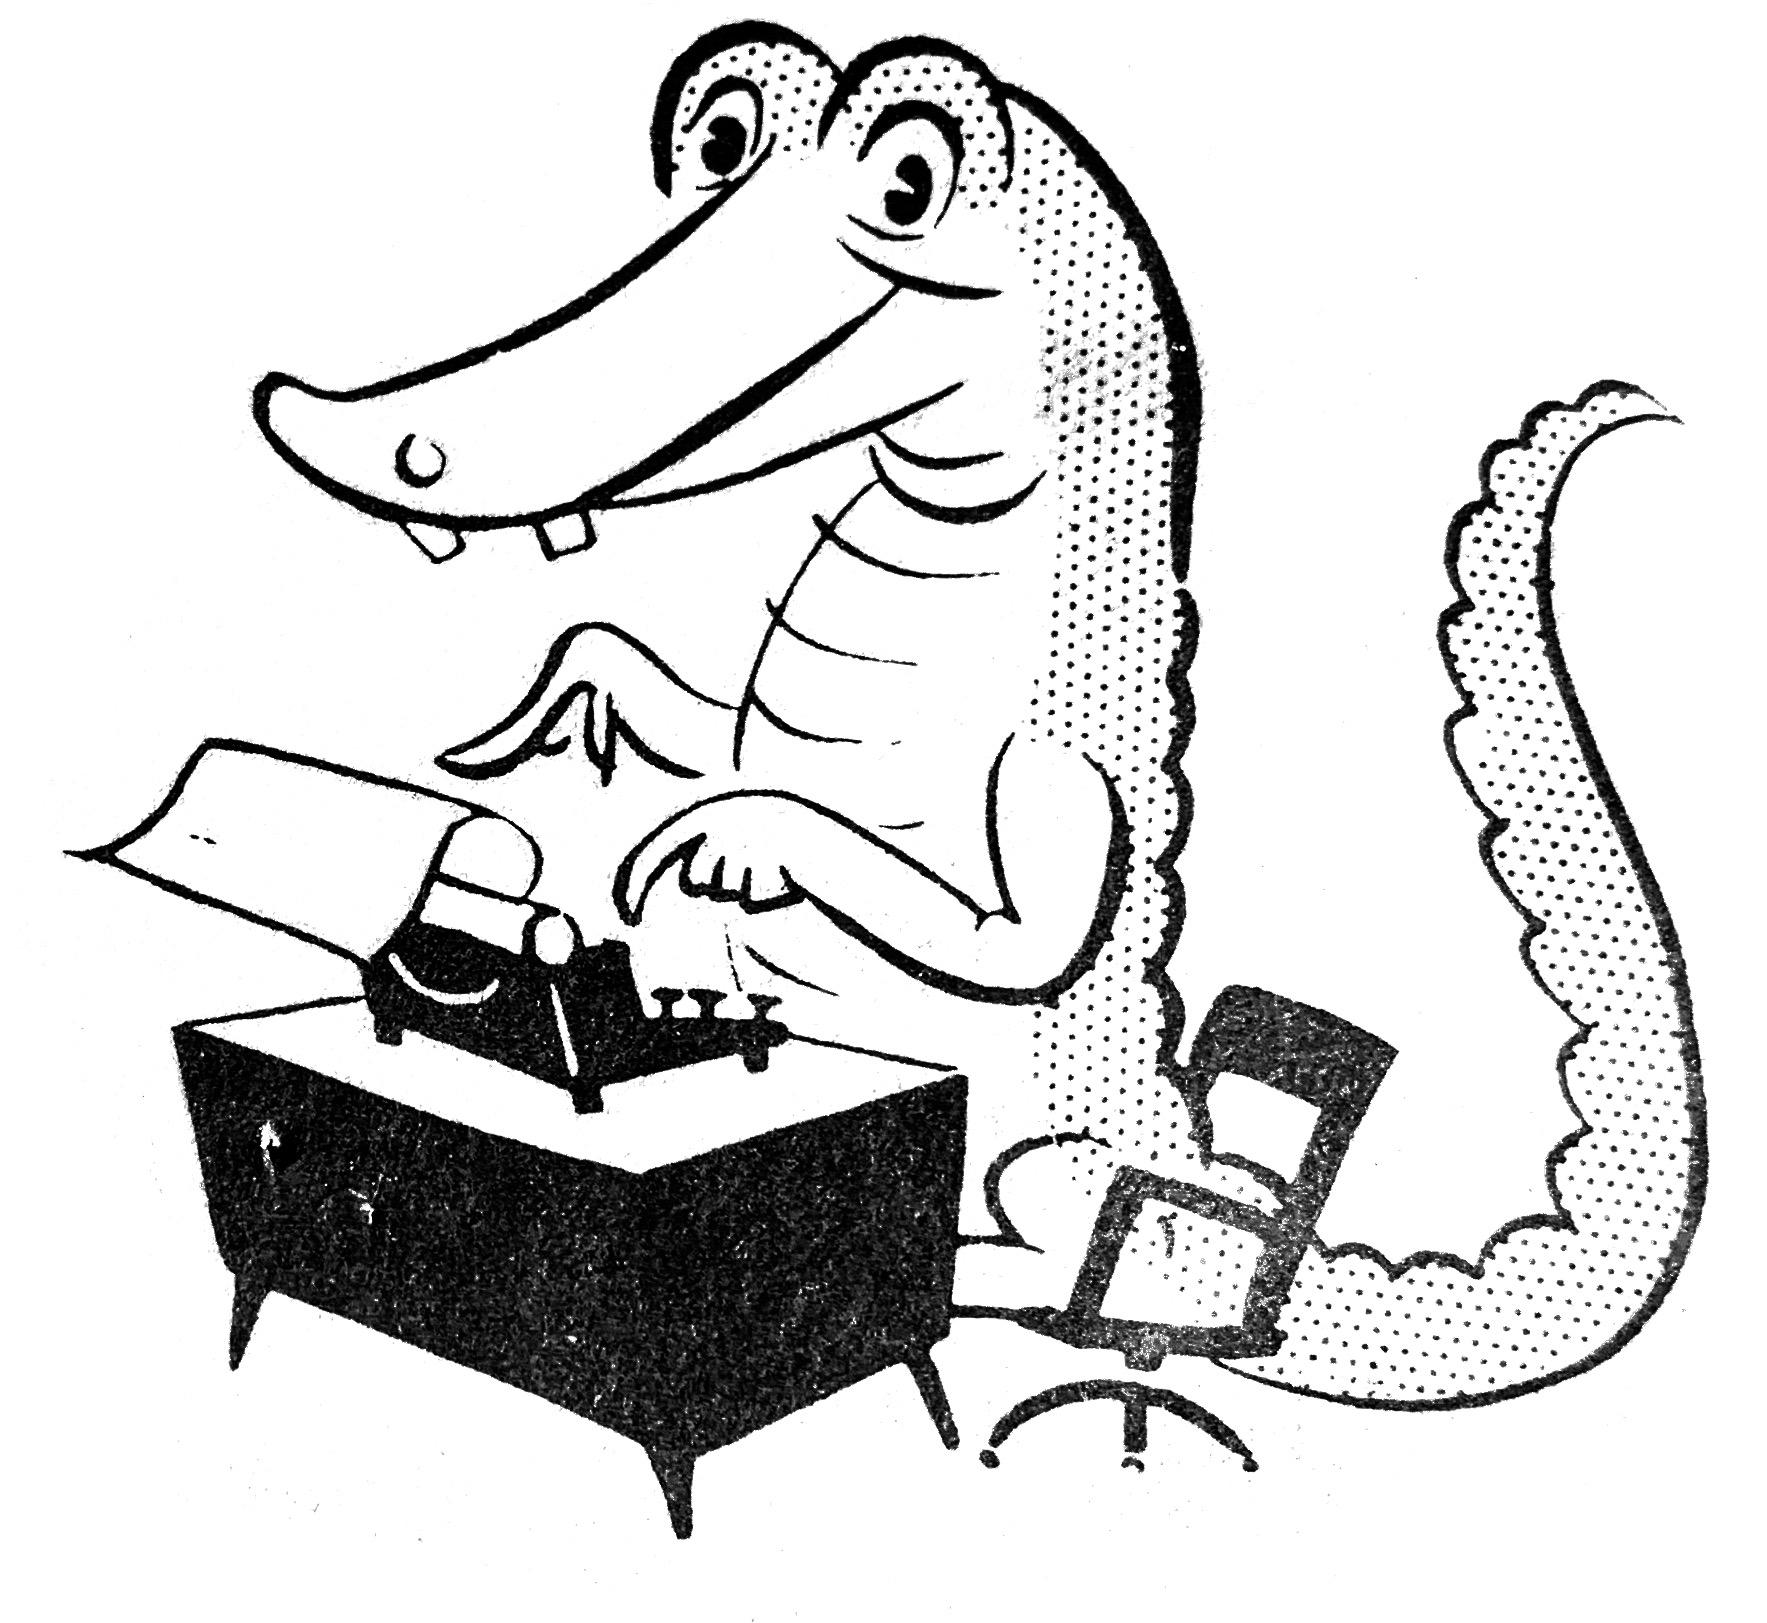 Al E. Gator, the South Gator Newsletter Mascot